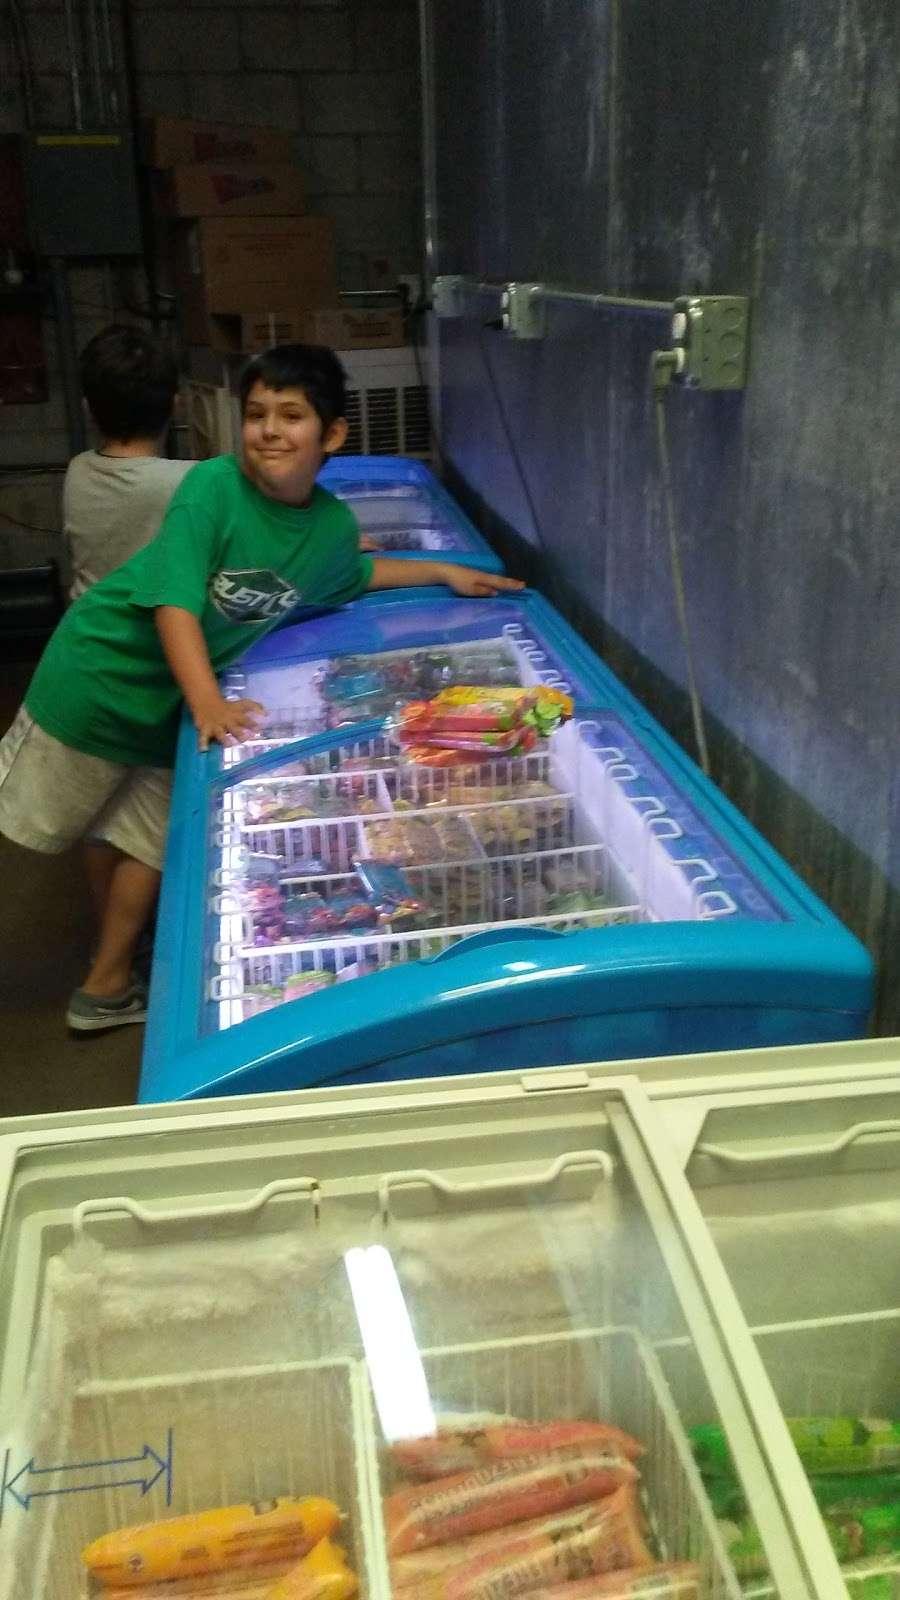 Paleteria Hidalgo - store    Photo 10 of 10   Address: 16565 Orange Way # I, Fontana, CA 92335, USA   Phone: (909) 350-4130